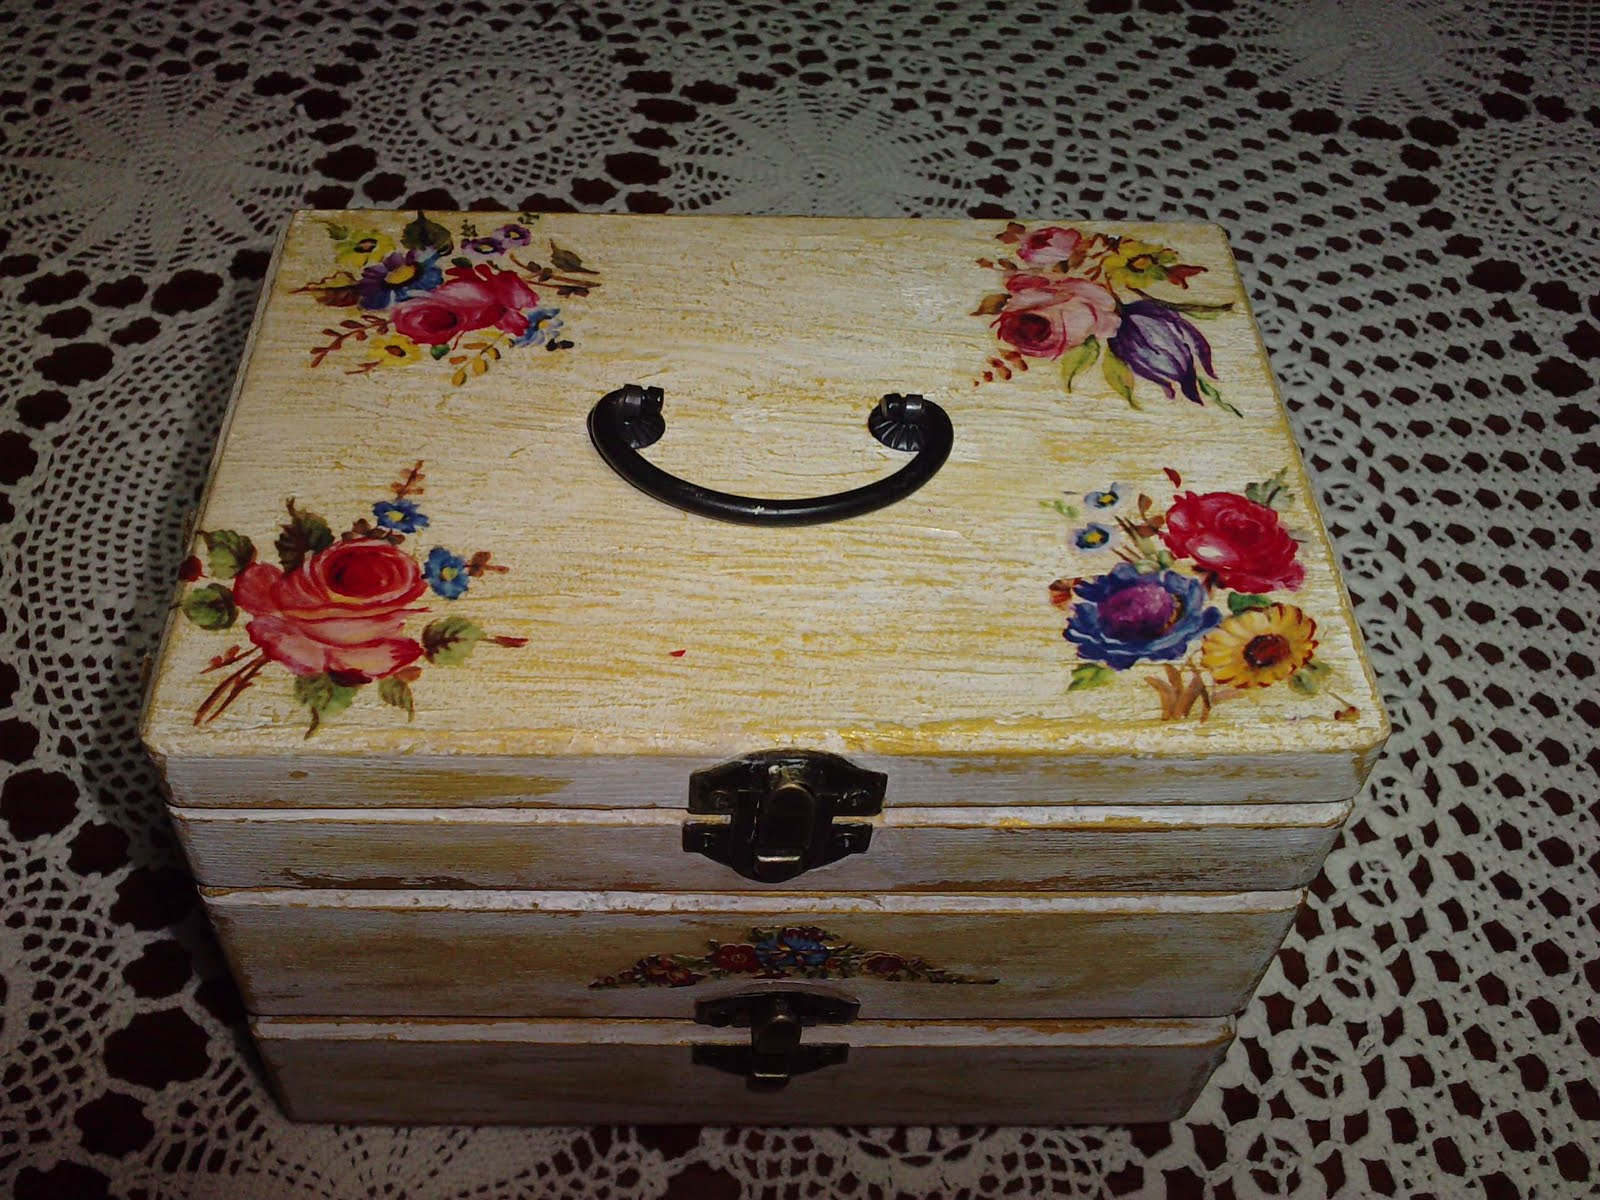 Artesania mydina cajas de madera decoradas en diferentes - Cajas de madera para decorar baratas ...